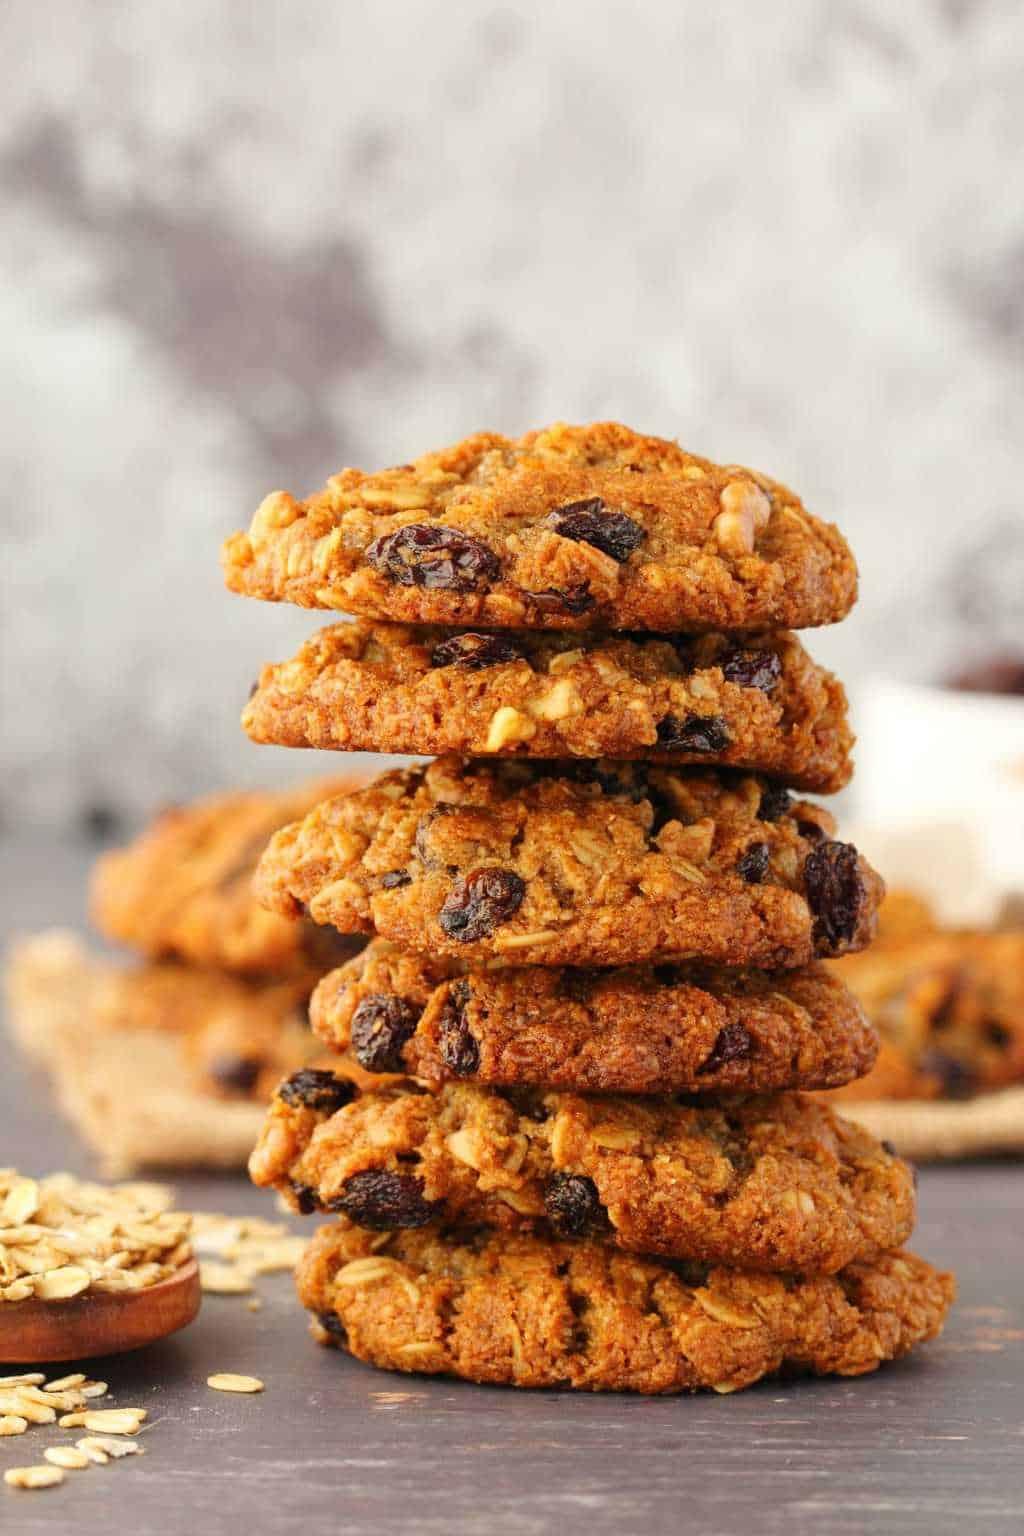 Vegan oatmeal raisin cookies in a stack of six.